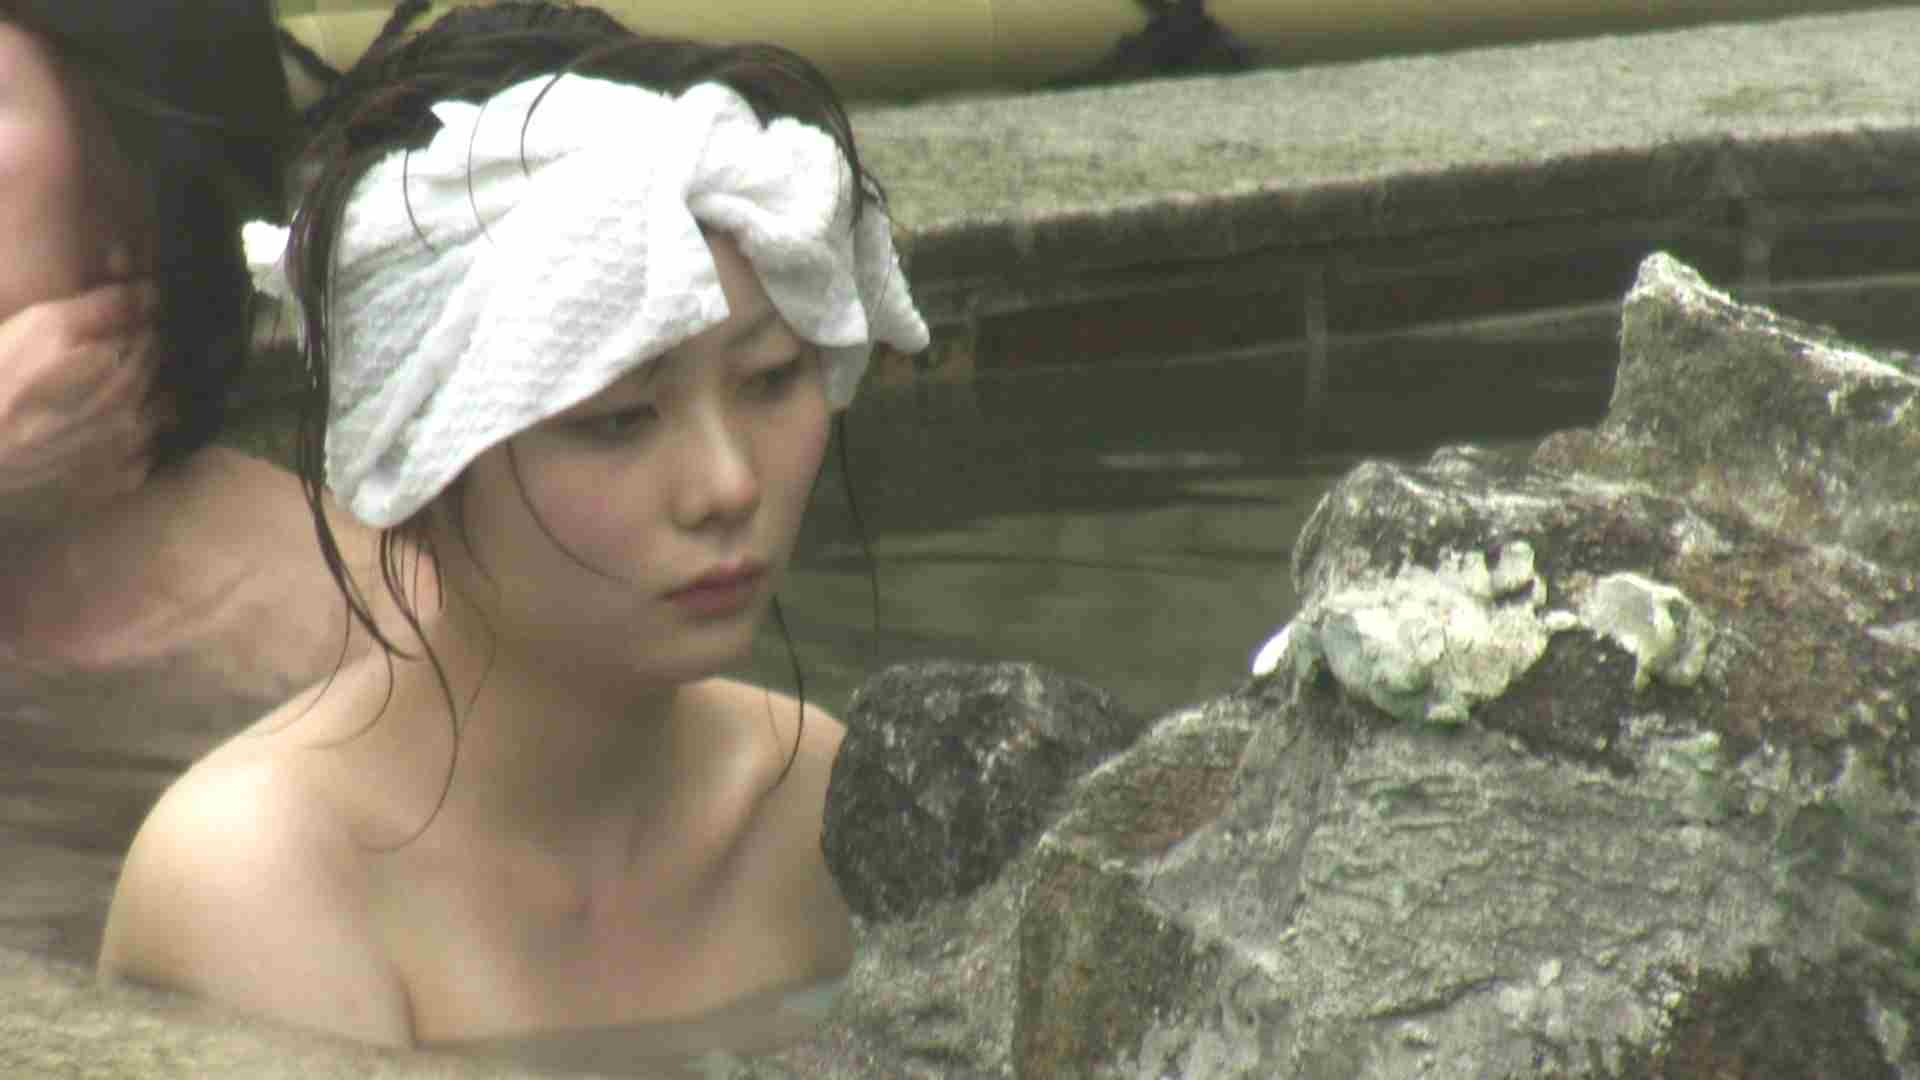 Aquaな露天風呂Vol.147 HなOL | 露天  103pic 27